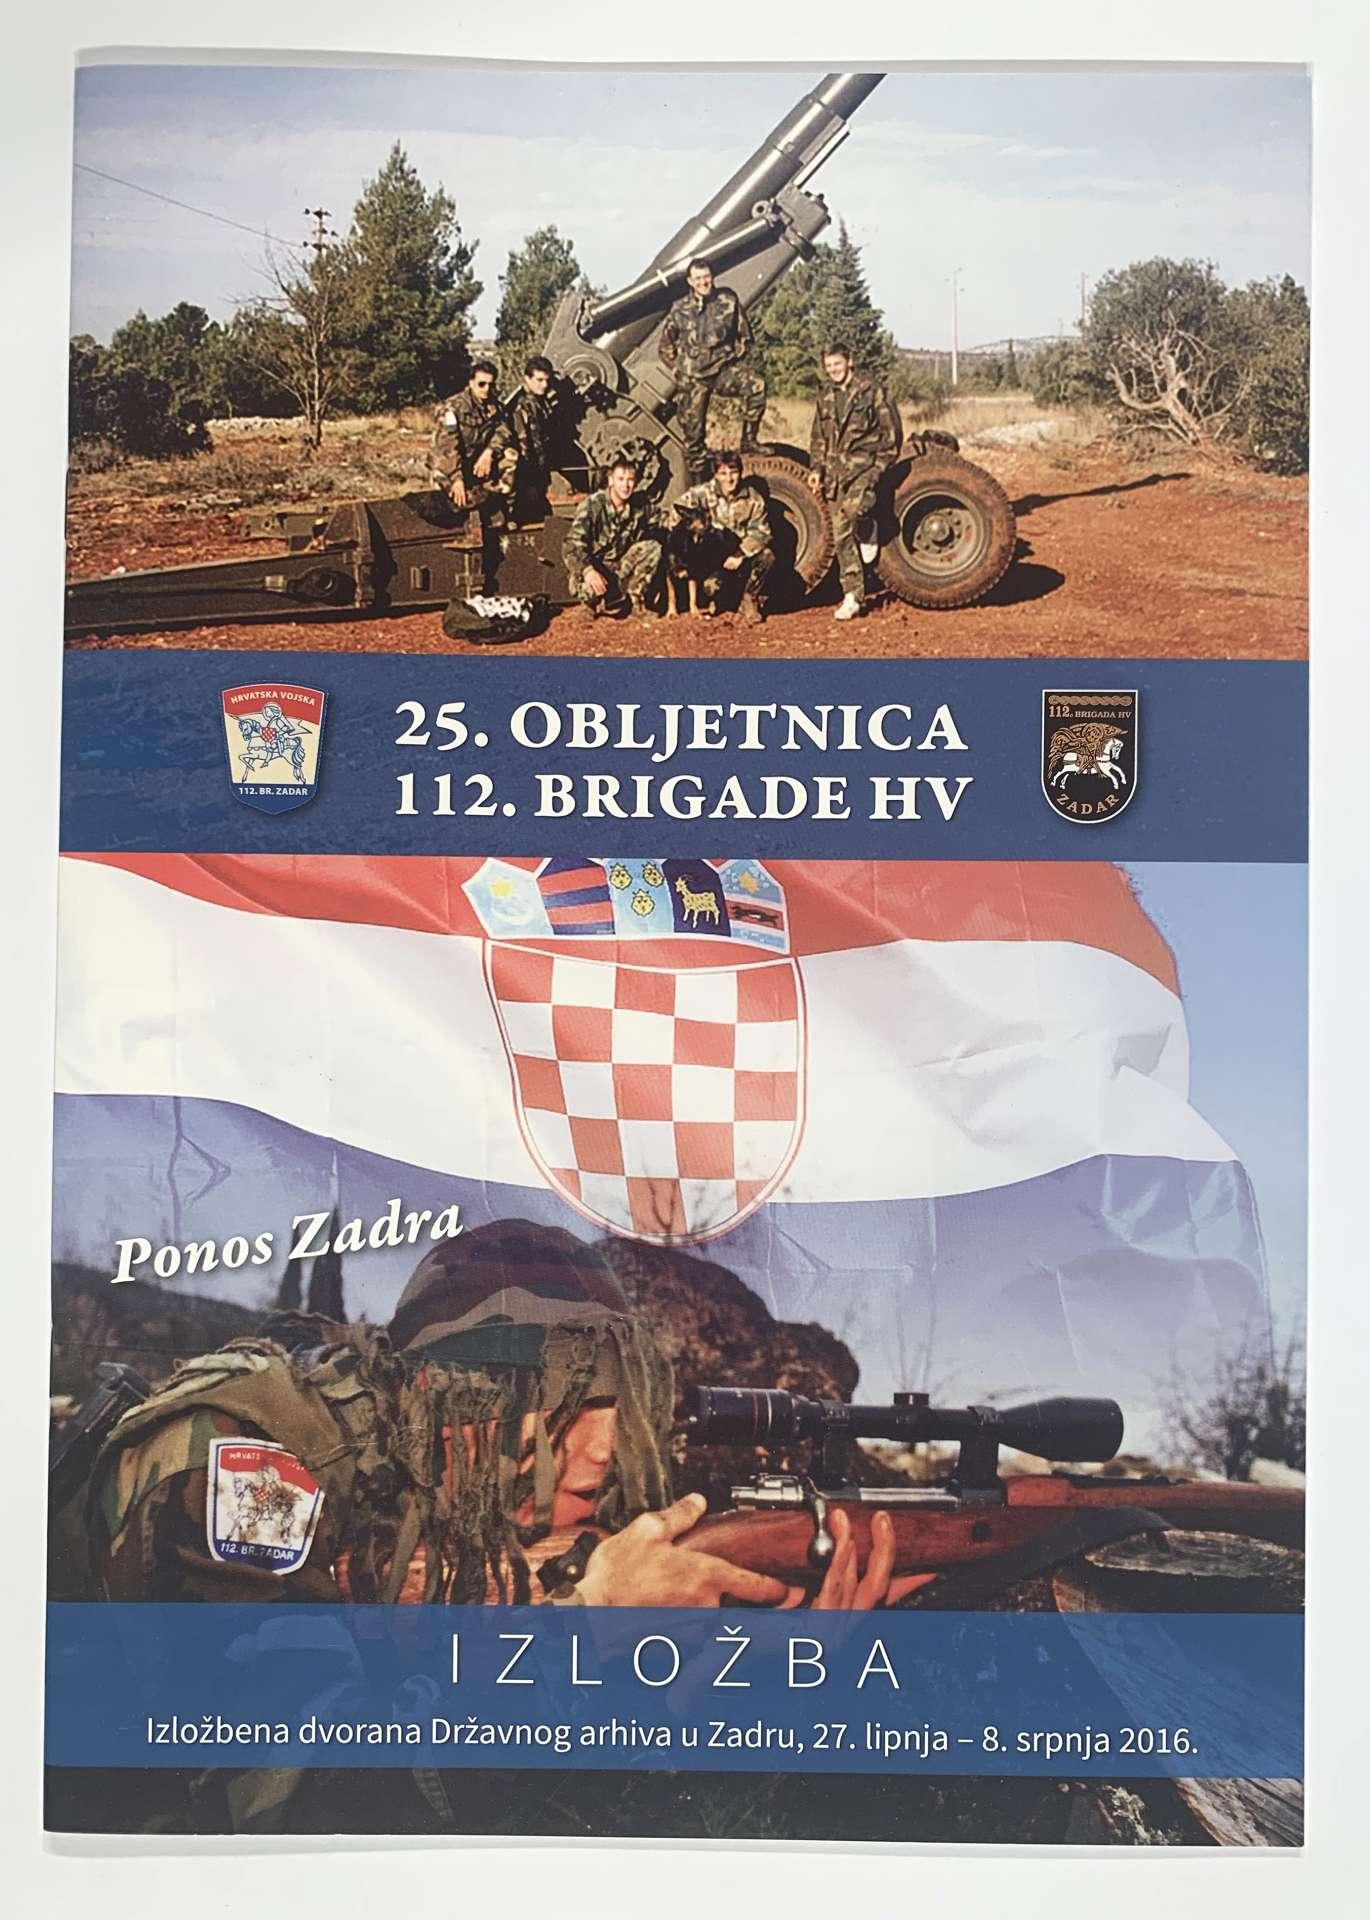 Dvadesetpeta 25. obljetnica 112. brigade